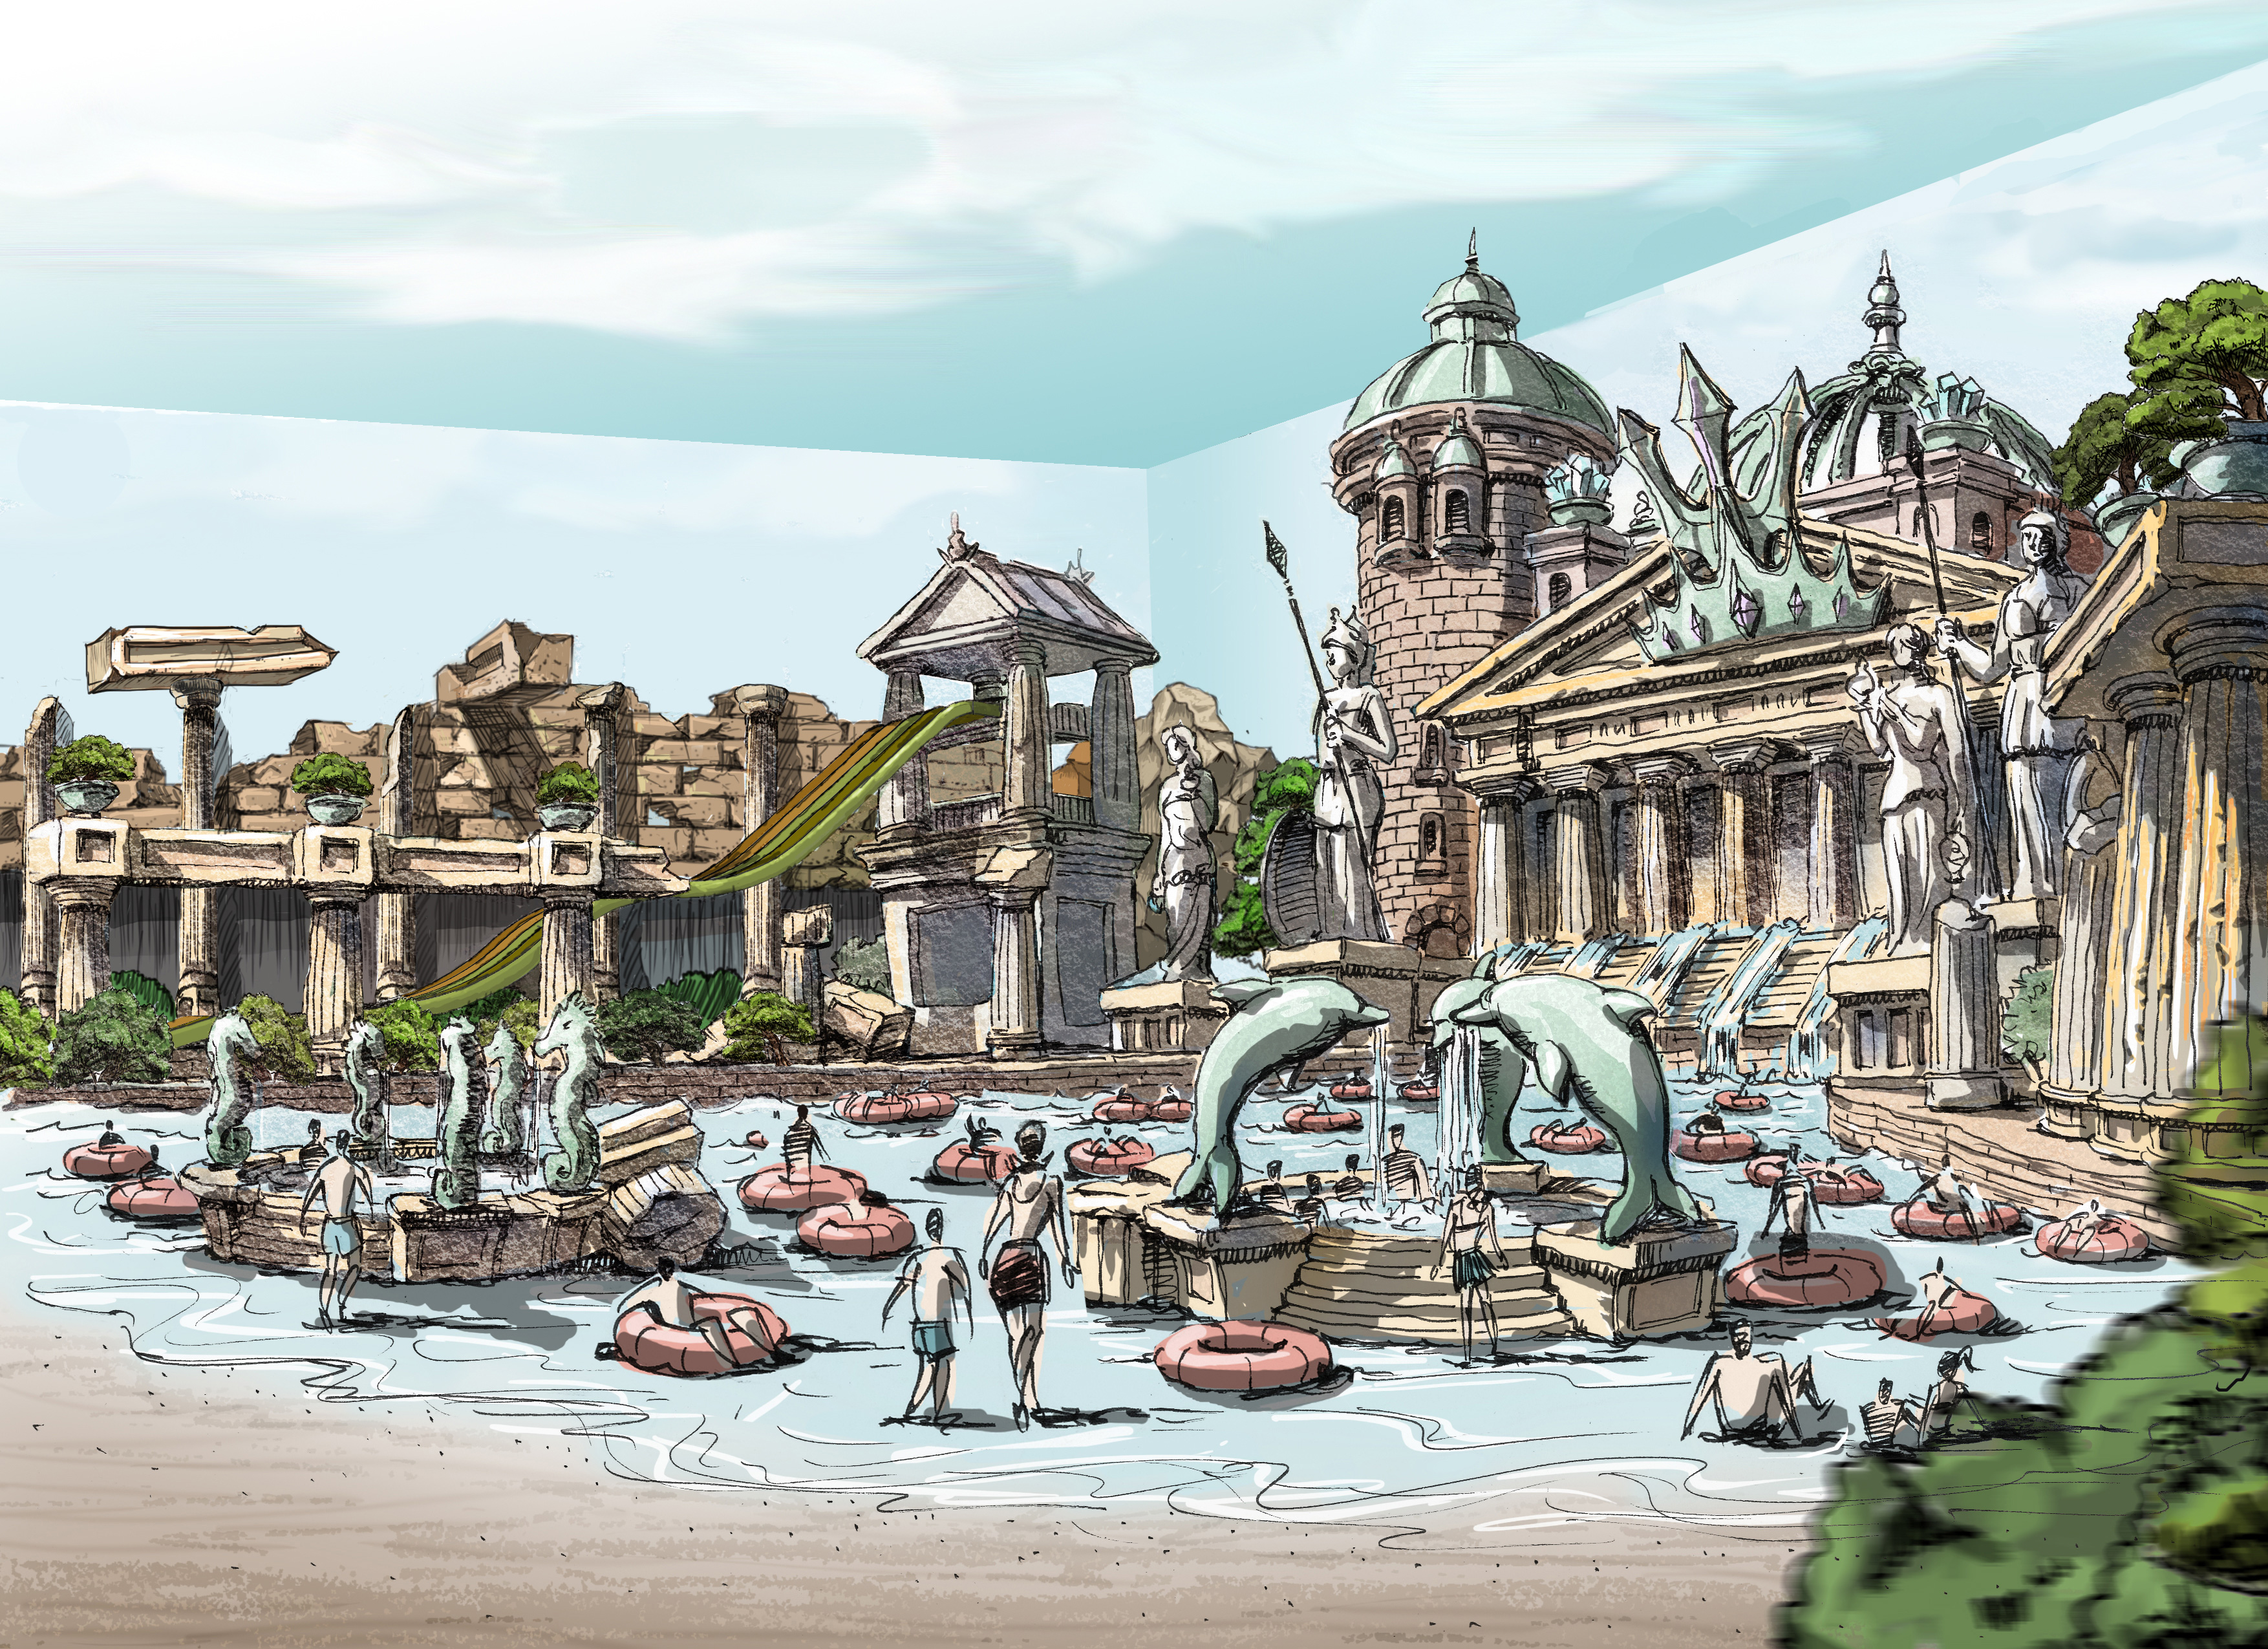 Water Park - DPI